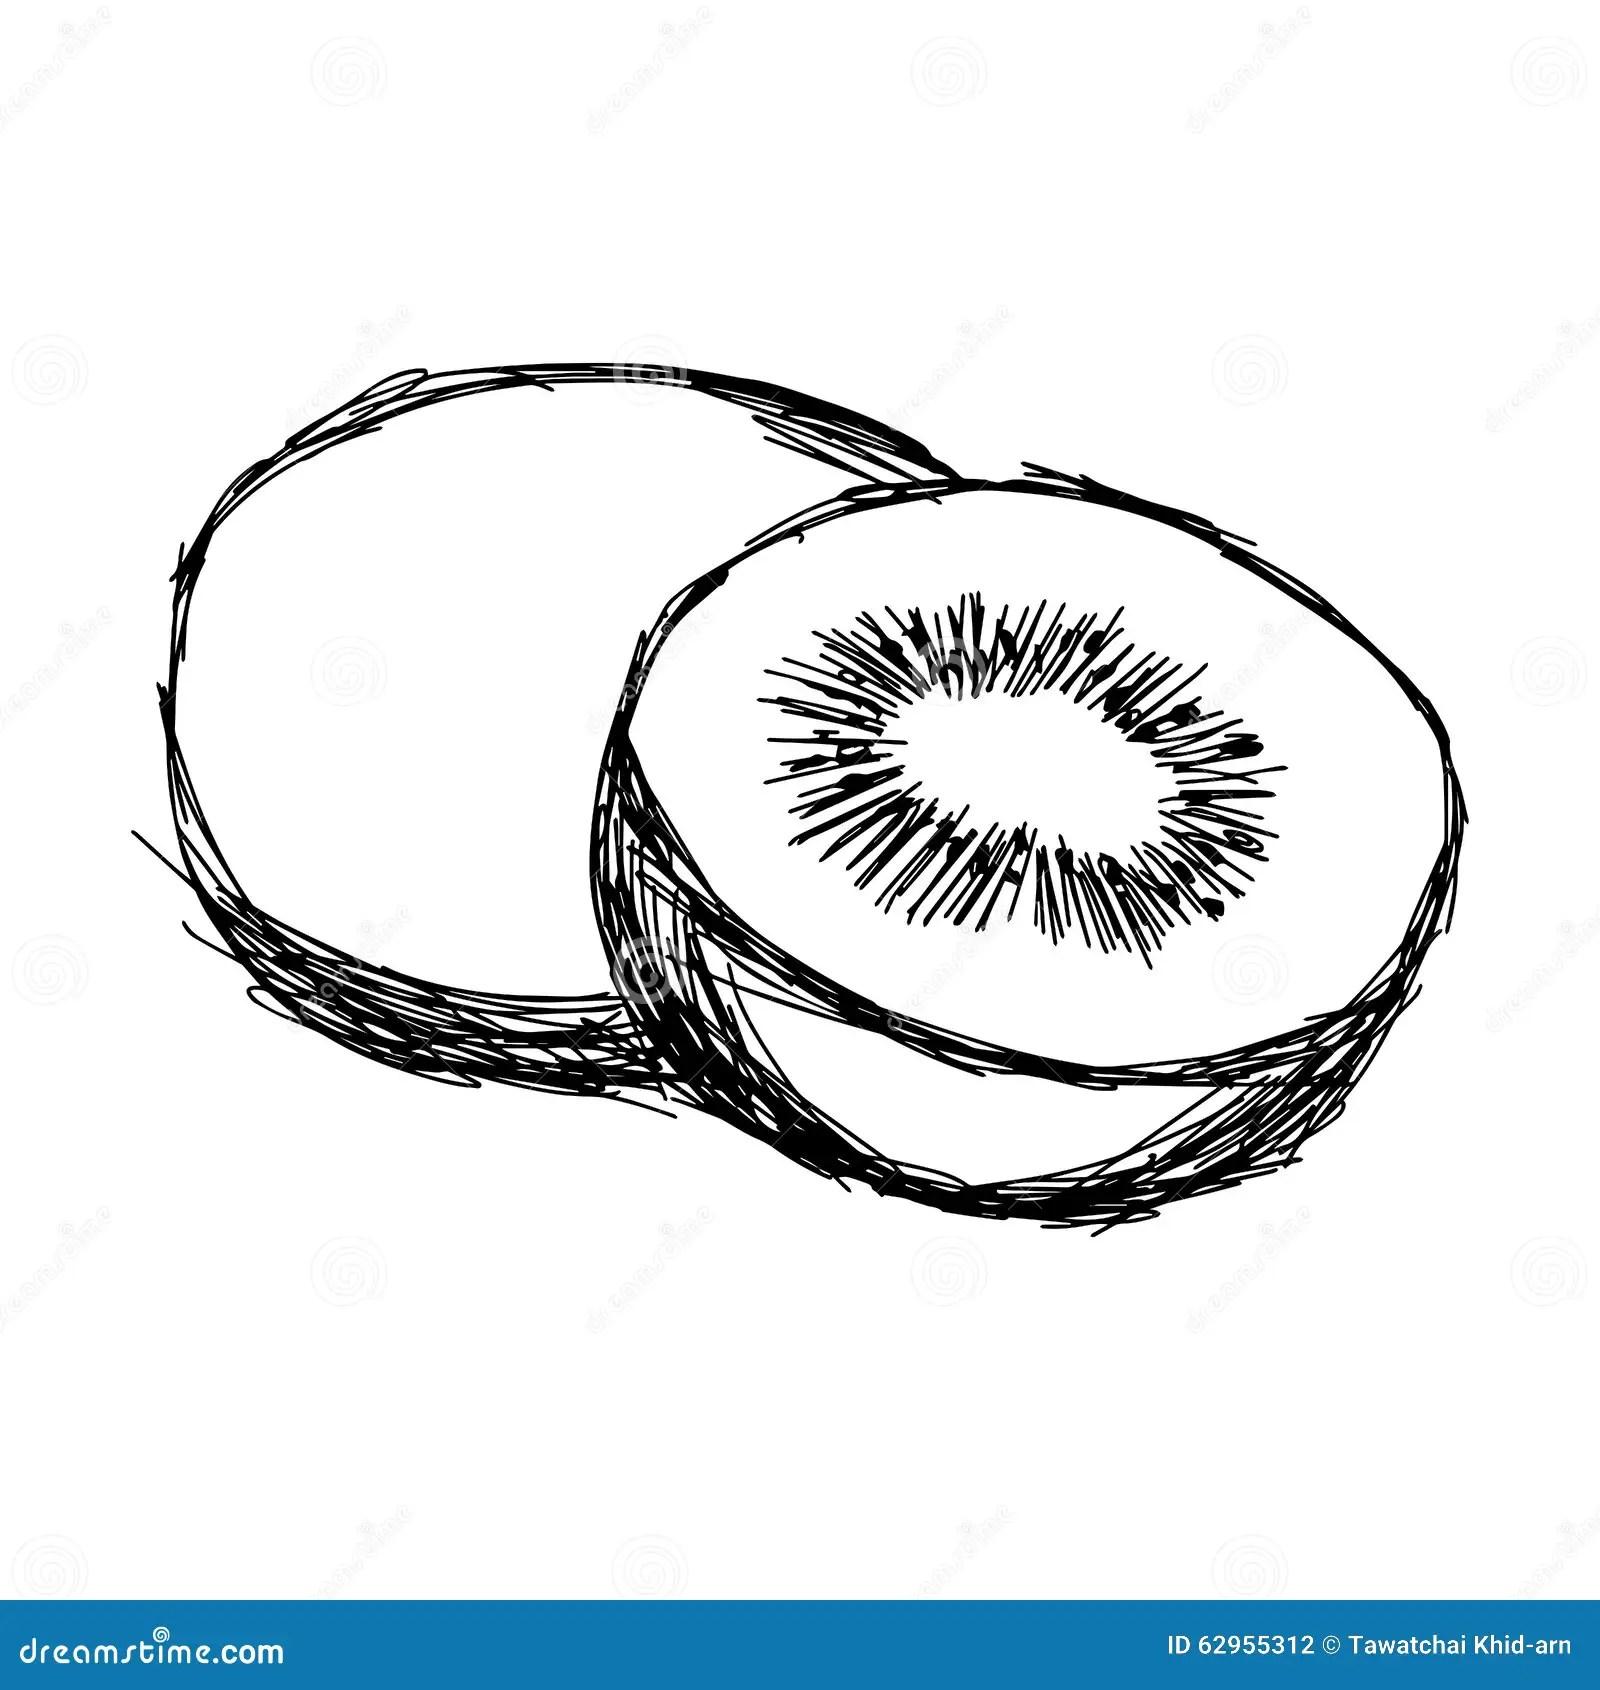 Illustration Vector Doodle Hand Drawn Of Sketch Kiwi